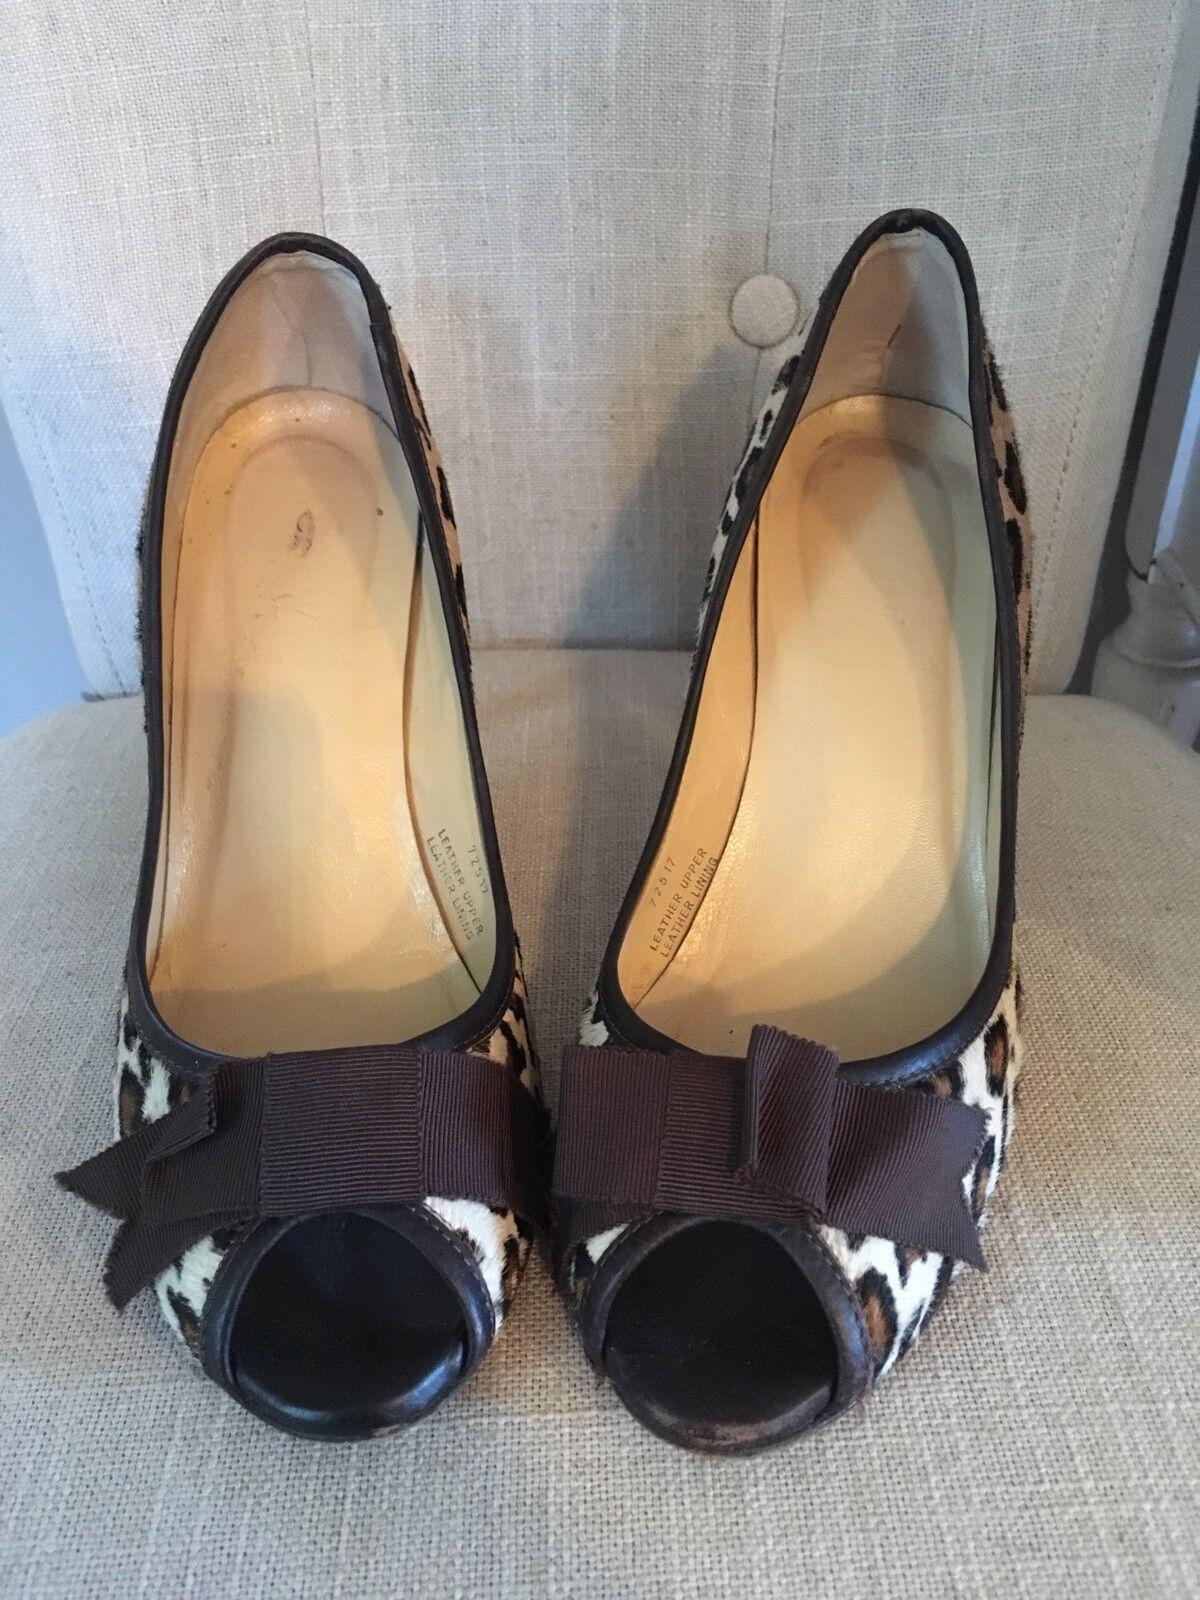 J Crew Calf grosgrain Hair Peep Toe Heels 8.5 grosgrain Calf bow Shoes 9e3a2e